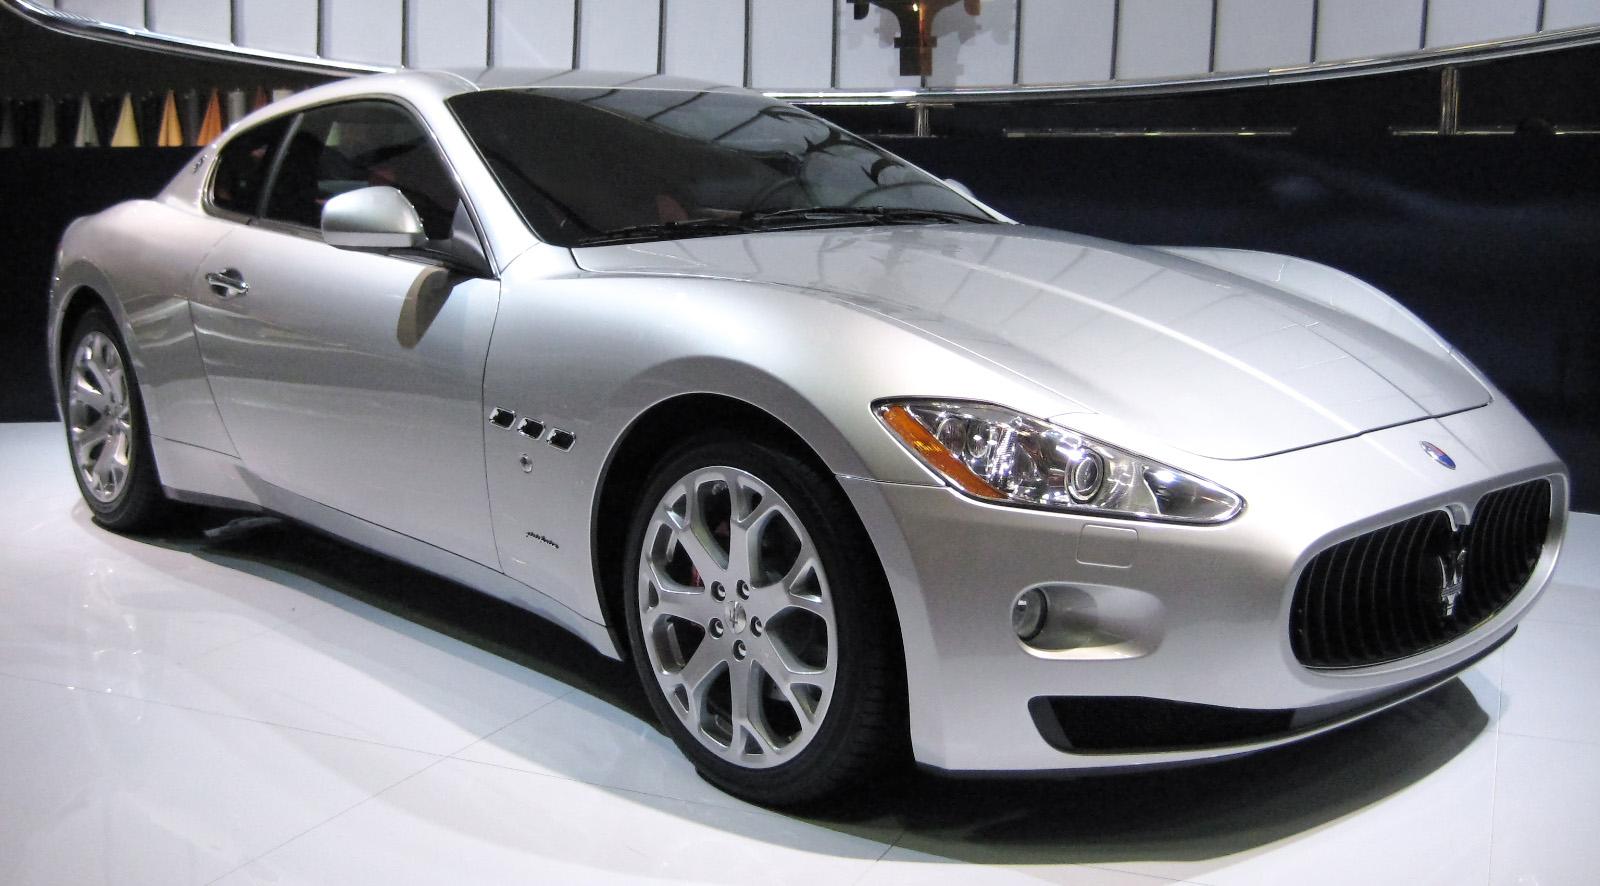 http://upload.wikimedia.org/wikipedia/commons/1/1d/Maserati_GranTurismo.JPG